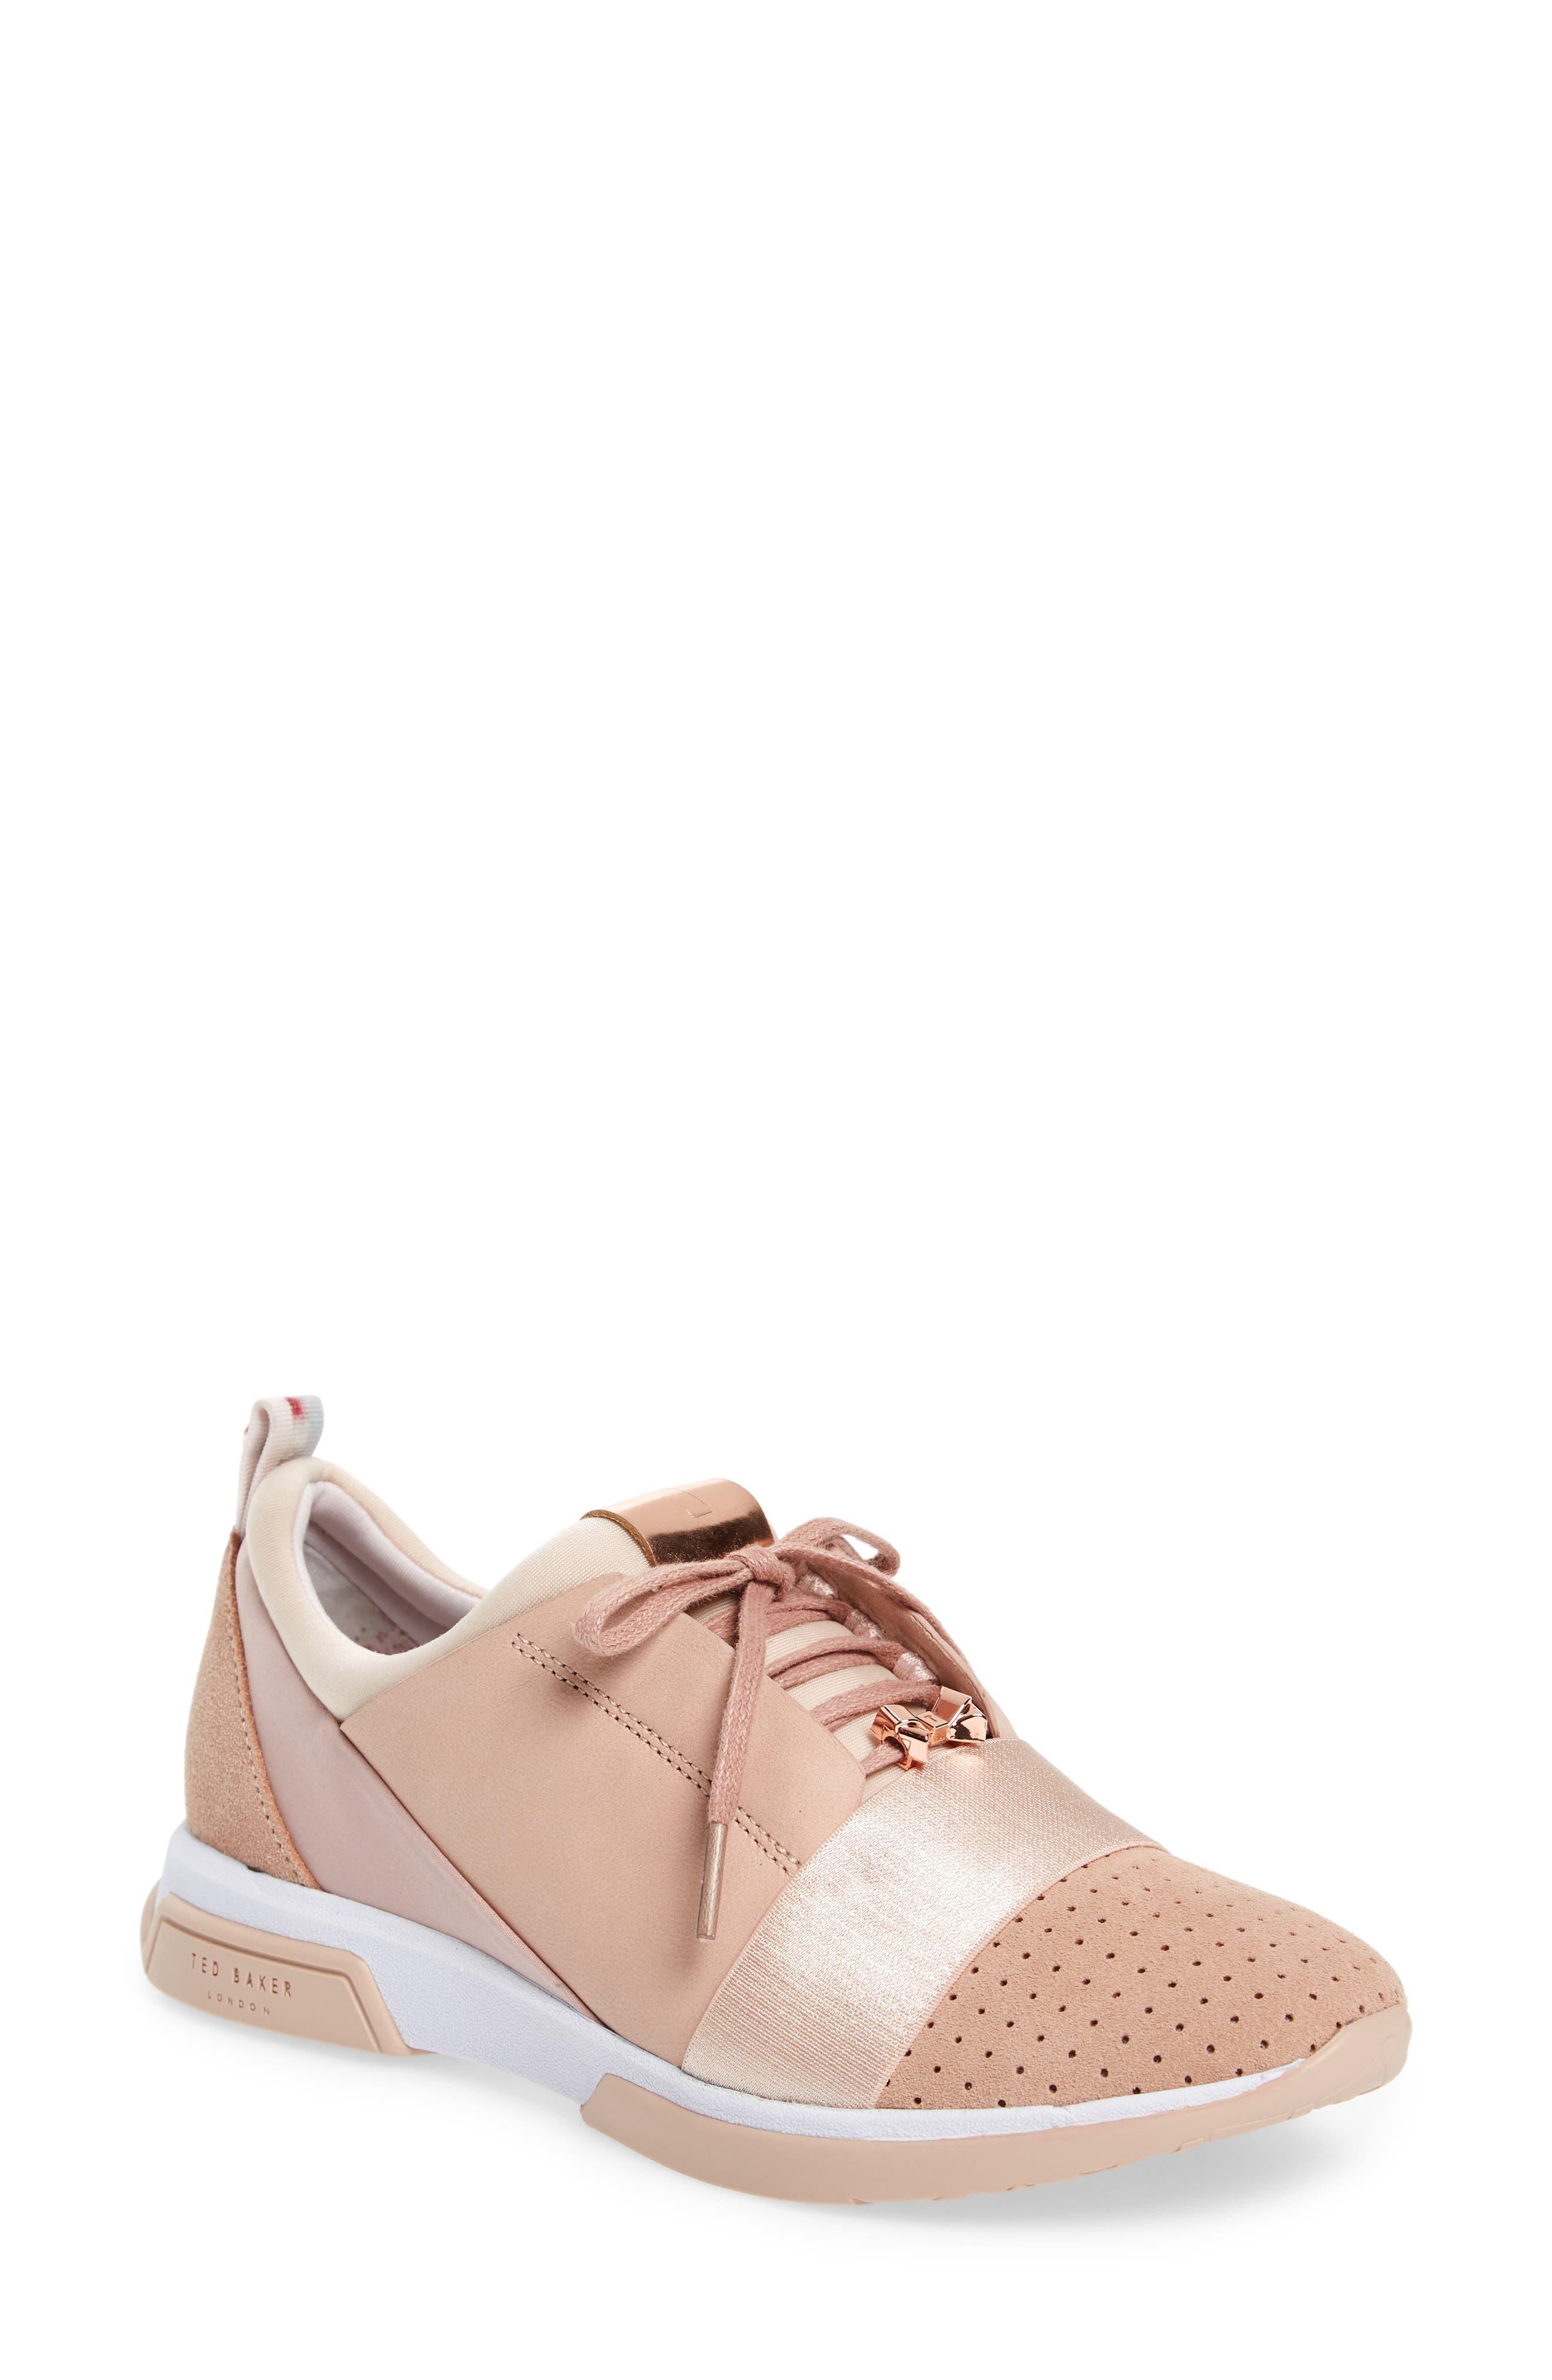 Cepa Sneaker,                         Main,                         color, LIGHT PINK